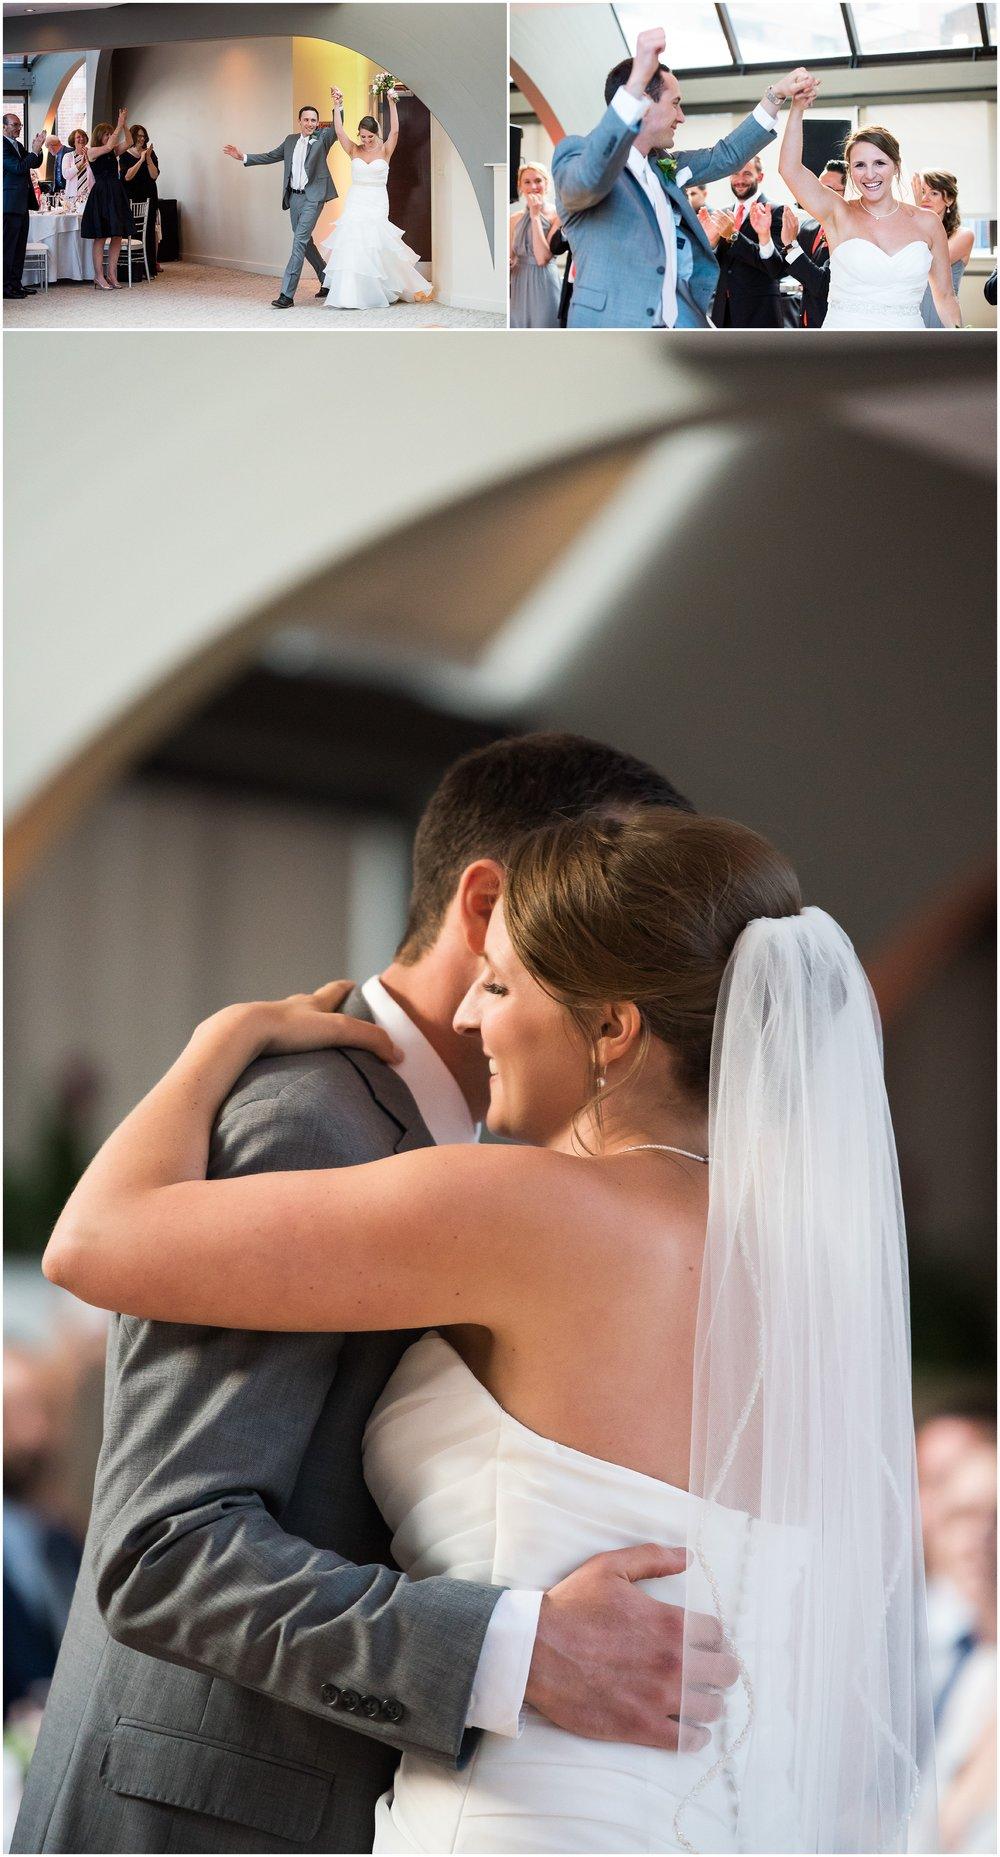 Boston Wedding Photographer, Iryna's Photography.The Bostonian Boston Hotel Wedding Photos,Ceremony at St Cecilia Parish,Wedding Photos, Boston Weddings. Charles River Wedding Photos, Esplanade Wedding Photos.